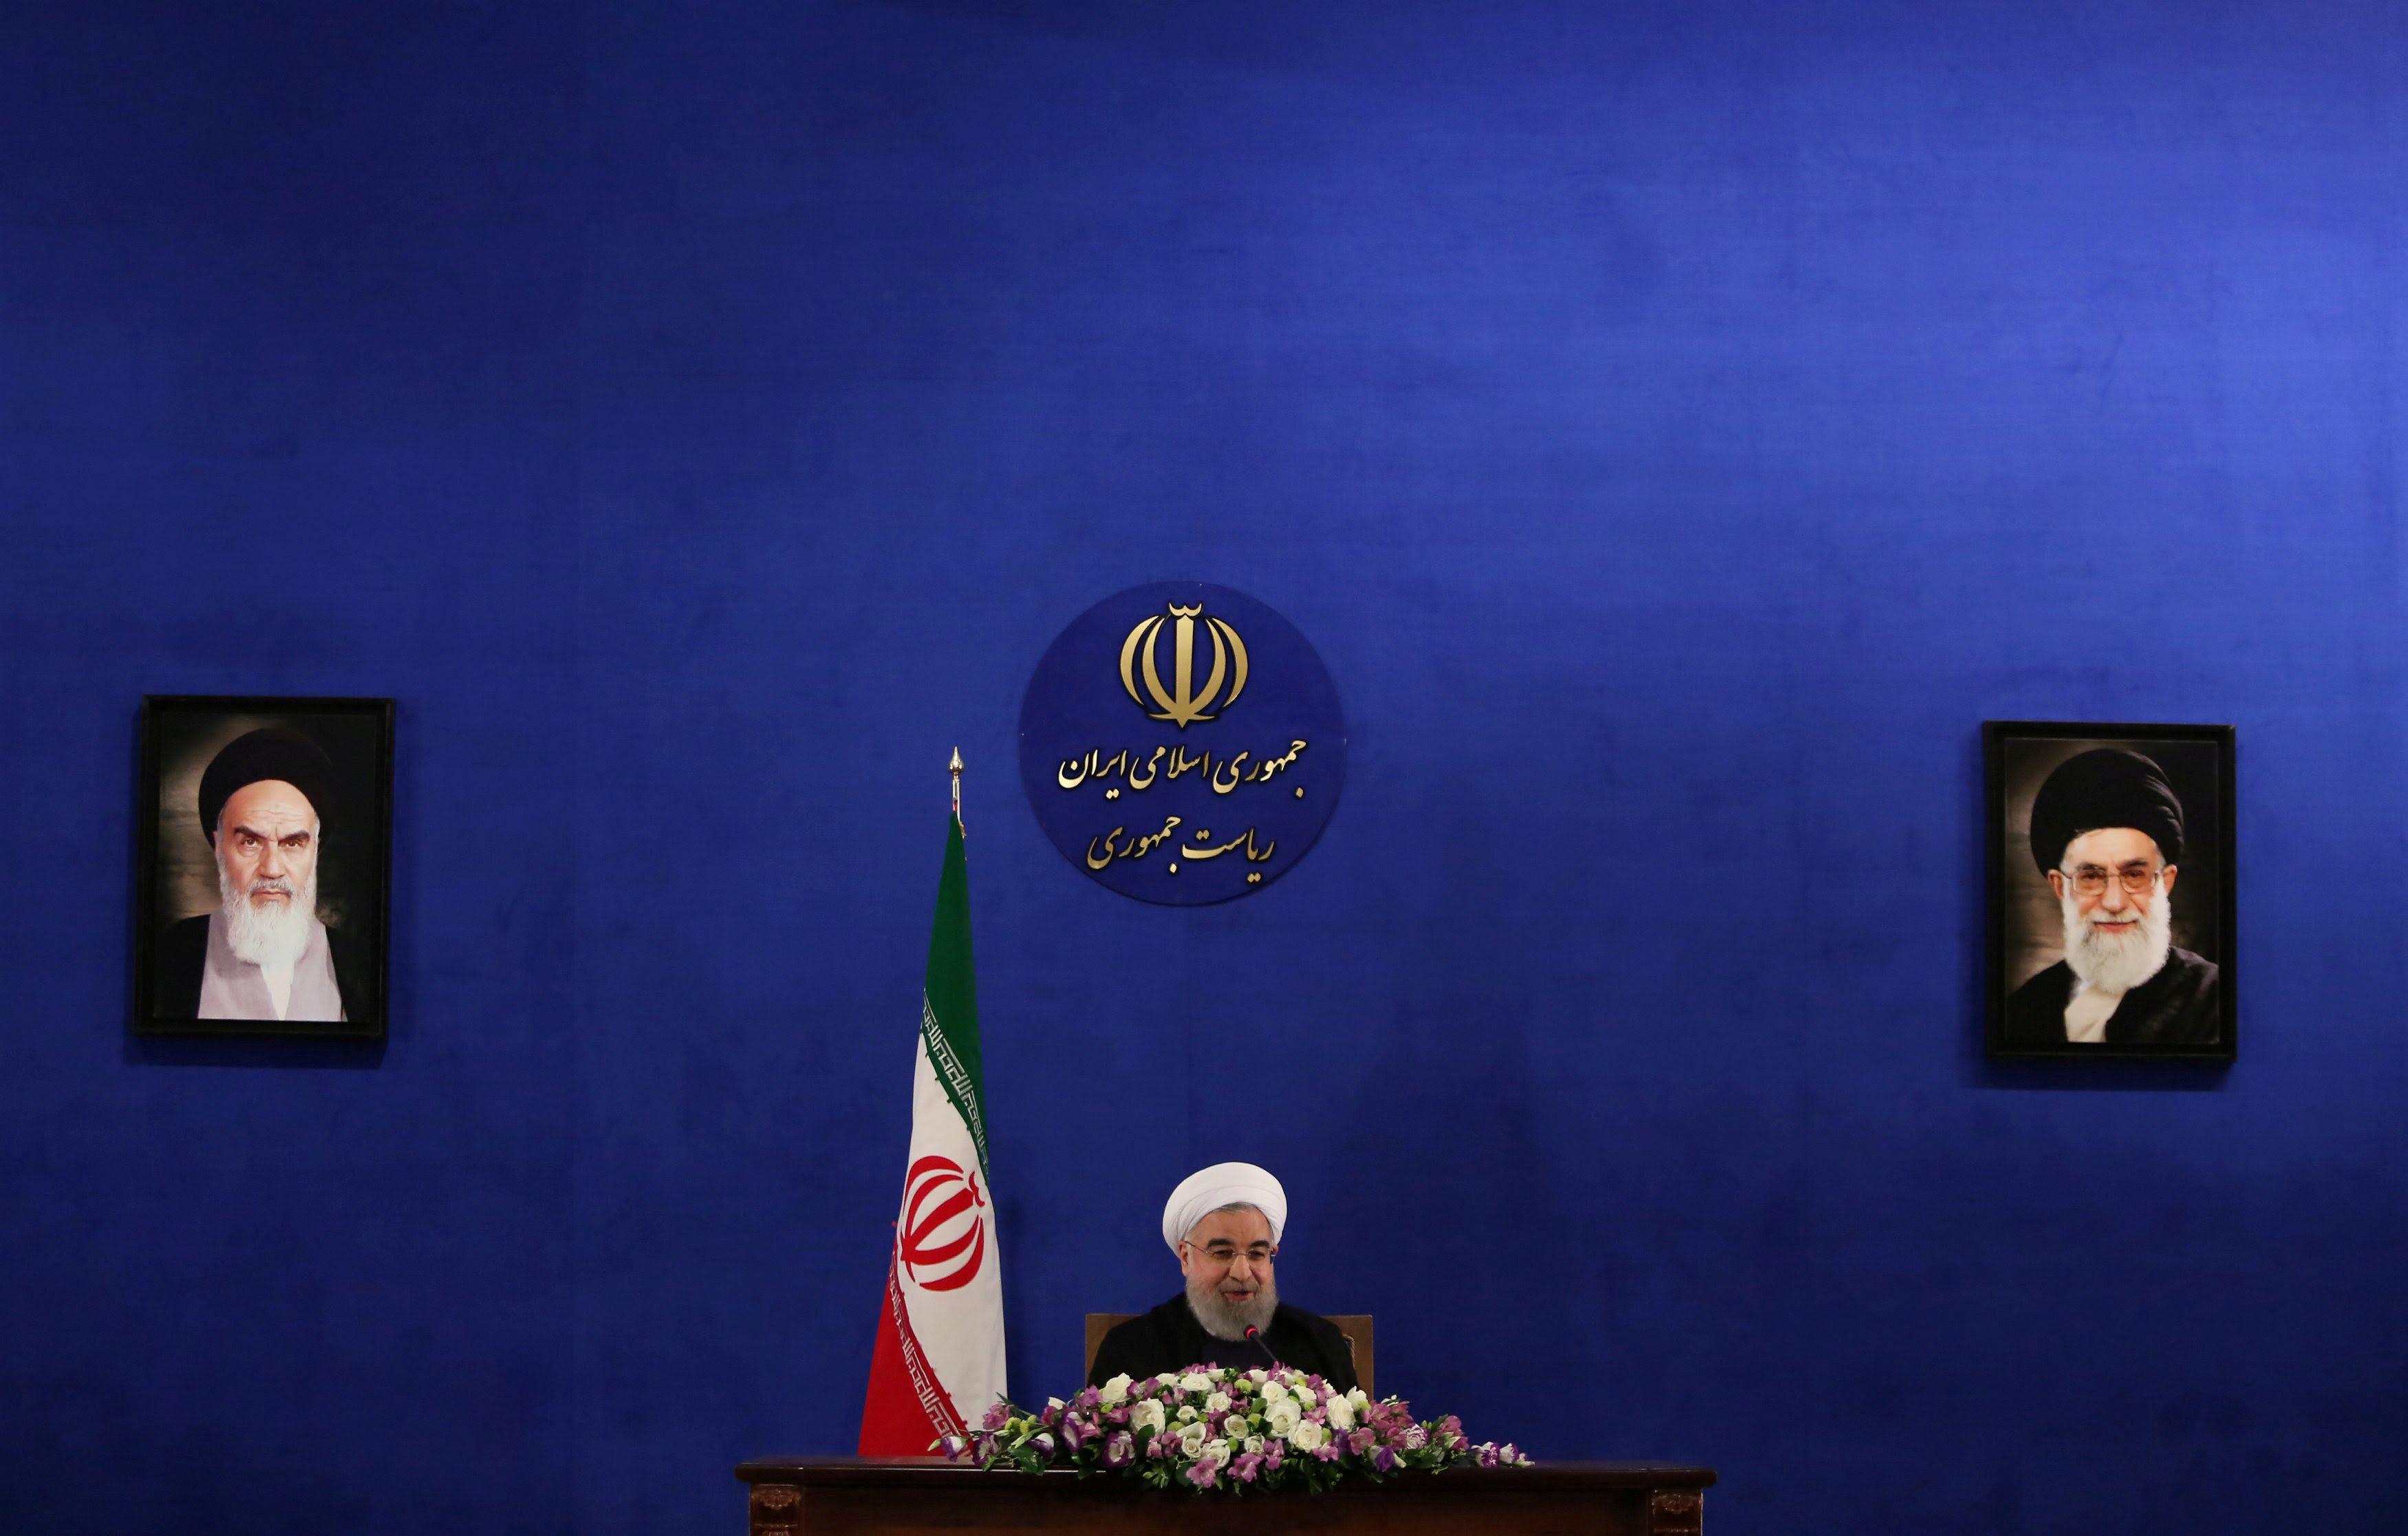 Empowering Iran's Hardliners